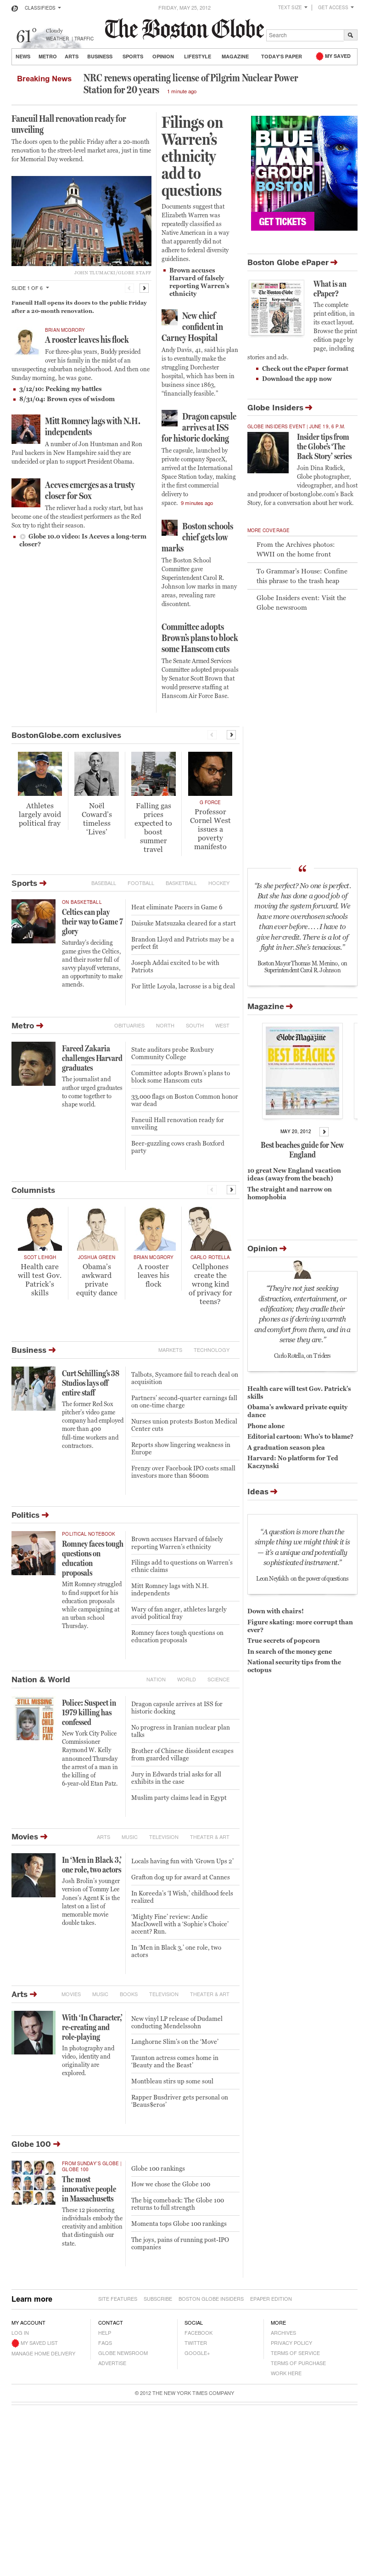 The Boston Globe at Friday May 25, 2012, 4:02 p.m. UTC